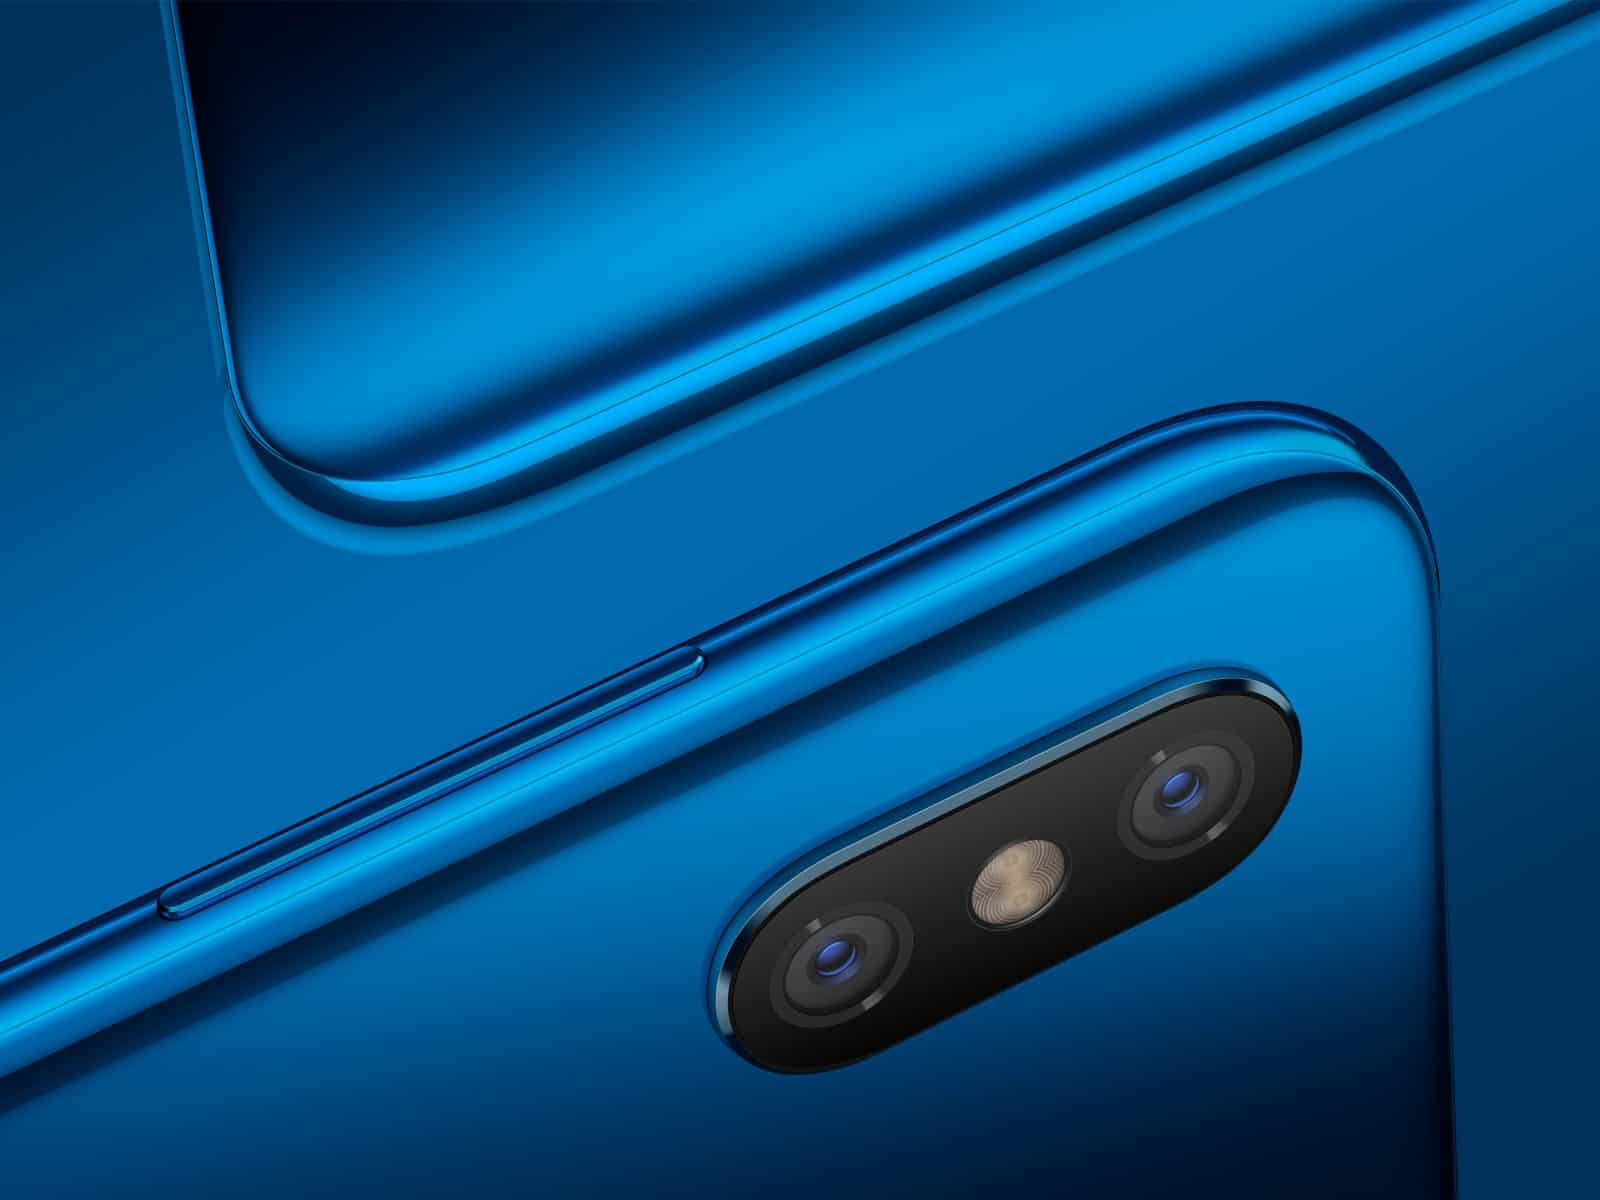 Xiaomi Mi 8 official image 59